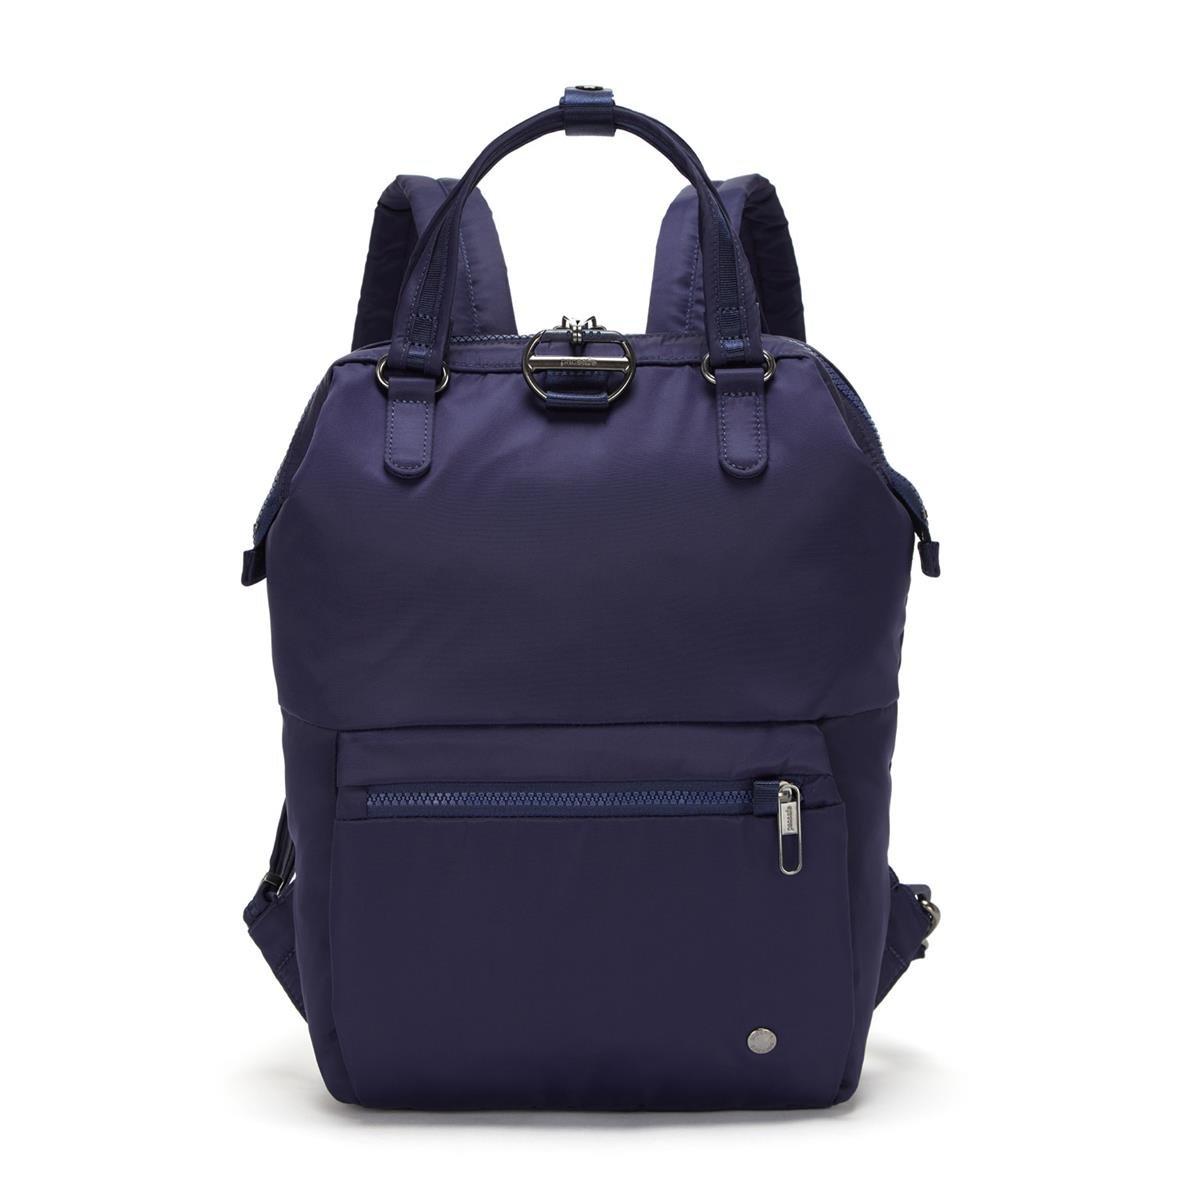 Torba damska antykradzieżowa Pacsafe Citysafe CX slim briefcase Black